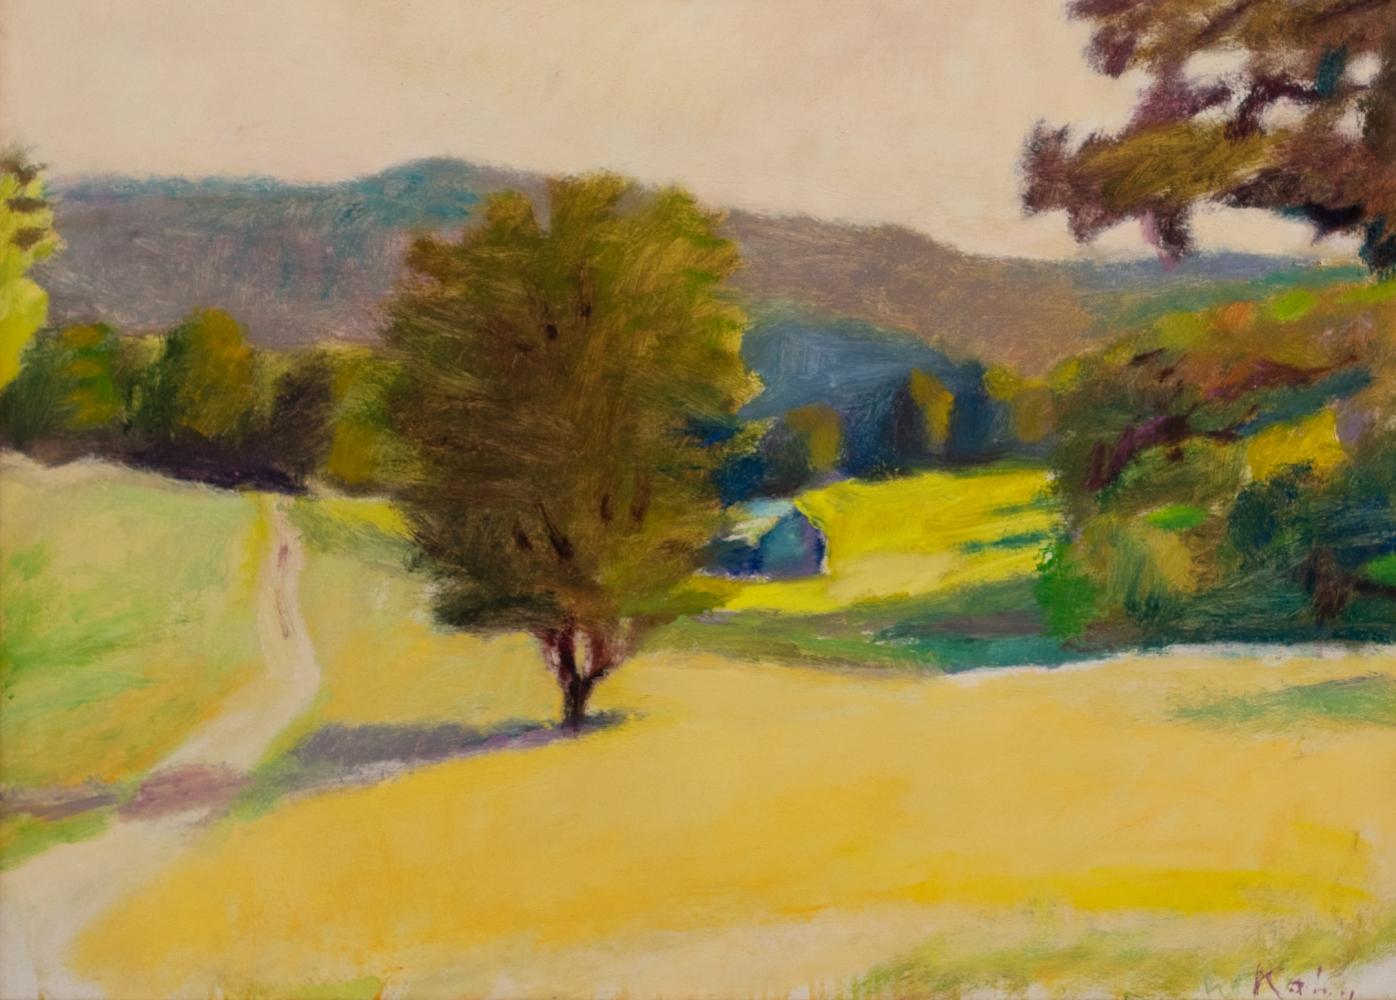 Wolf Kahn, Farmer Olsen's Field, Oil on linen, Wolf Kahn art for sale, Wolf Kahn Landscape Paintings, Wolf Kahn Oil Paintings